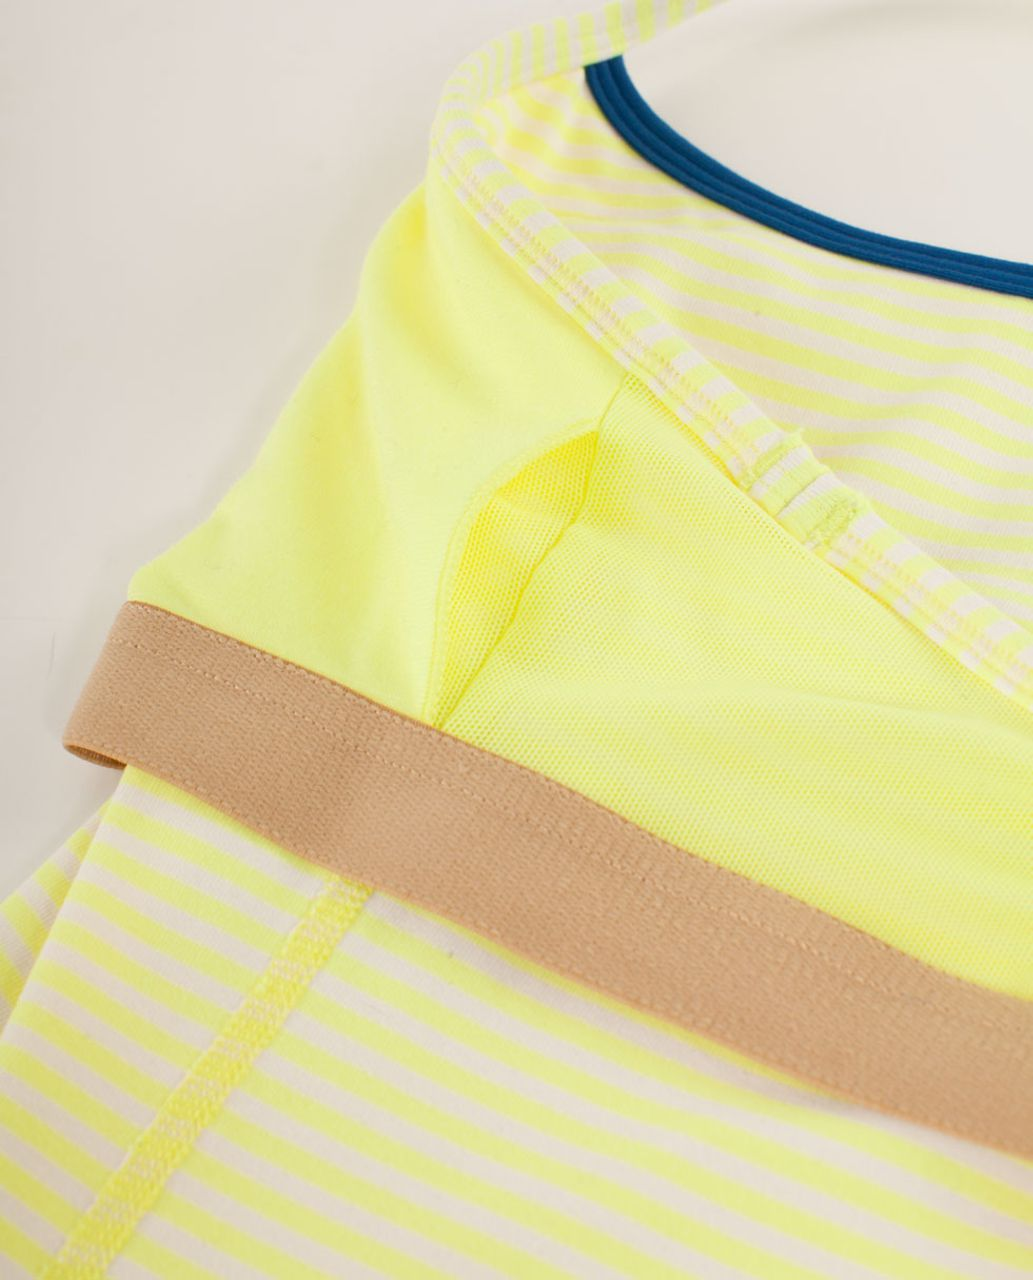 Lululemon Power Y Tank *Luon Light - Slope Stripe Polar Cream Clarity Yellow / Limitless Blue